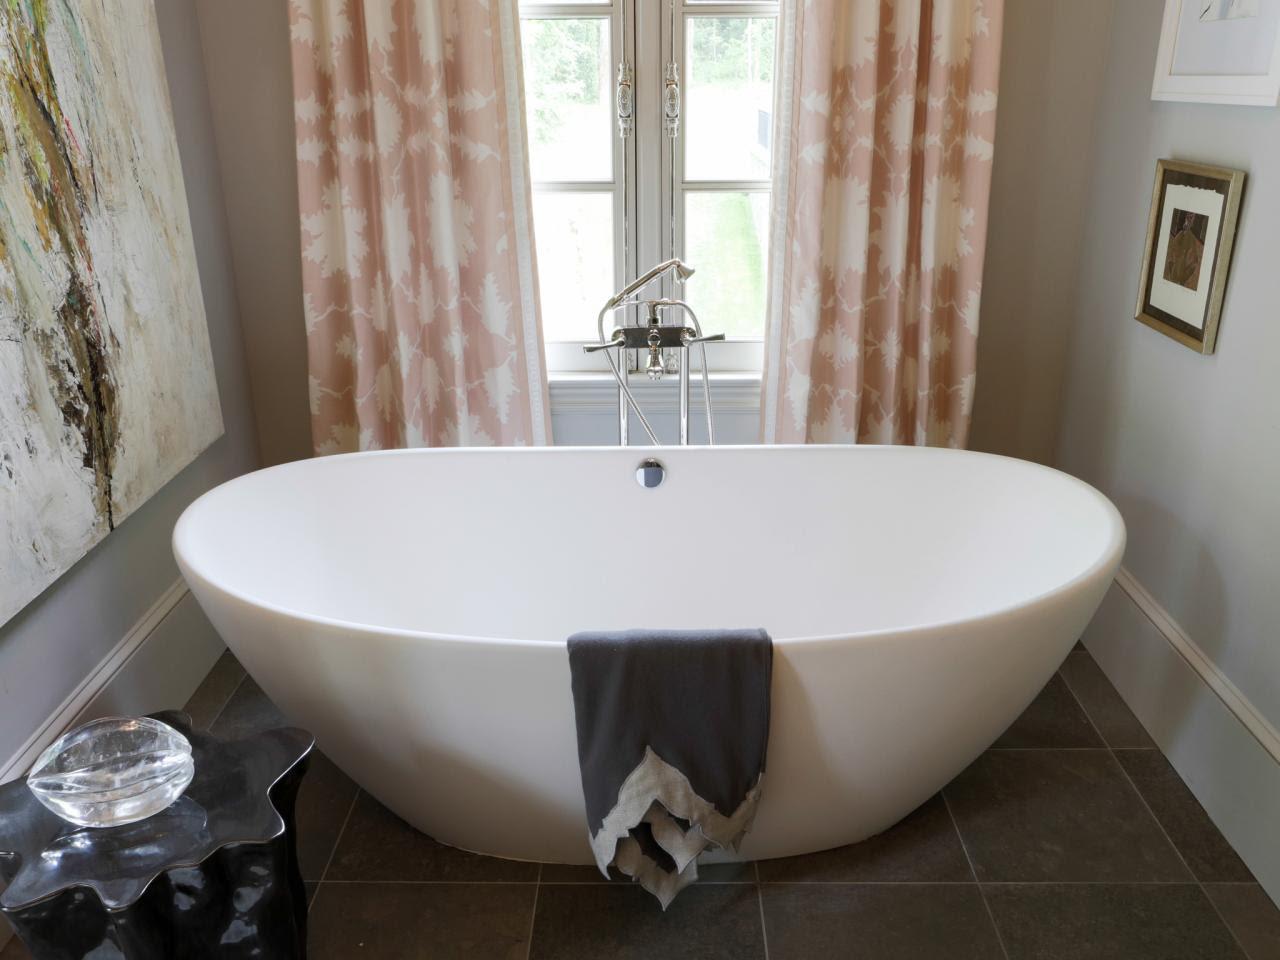 Corner Bathtub Design Ideas: Pictures & Tips From HGTV ...